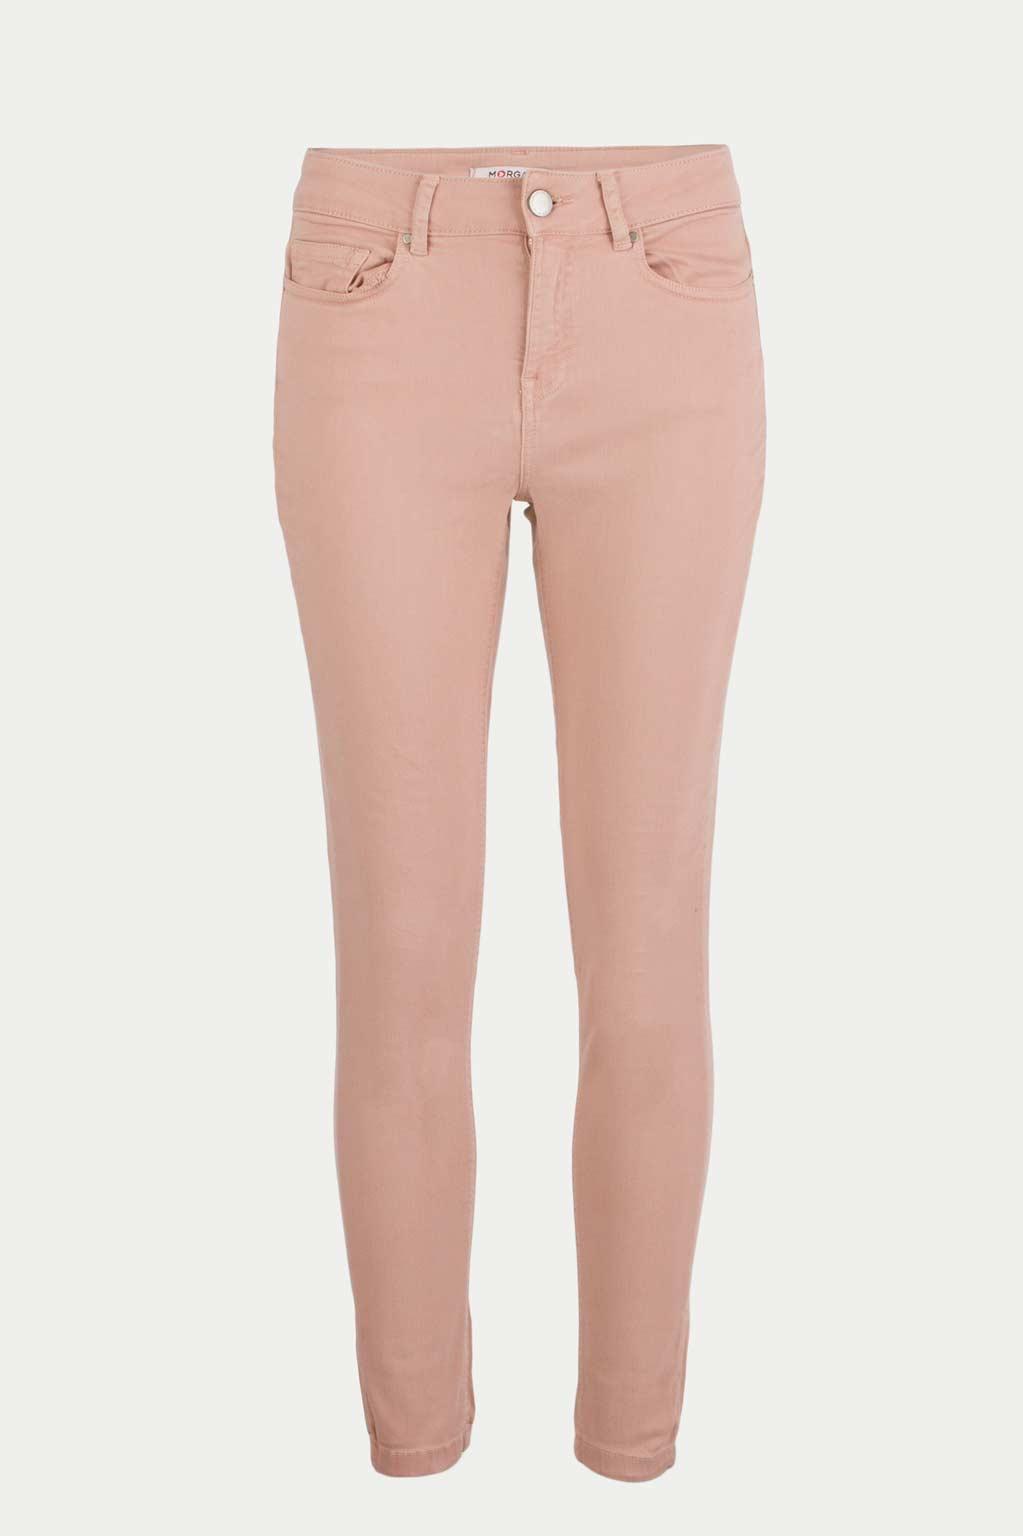 ג'ינס סקיני סטרצ'י MORGAN - צבע לבחירה